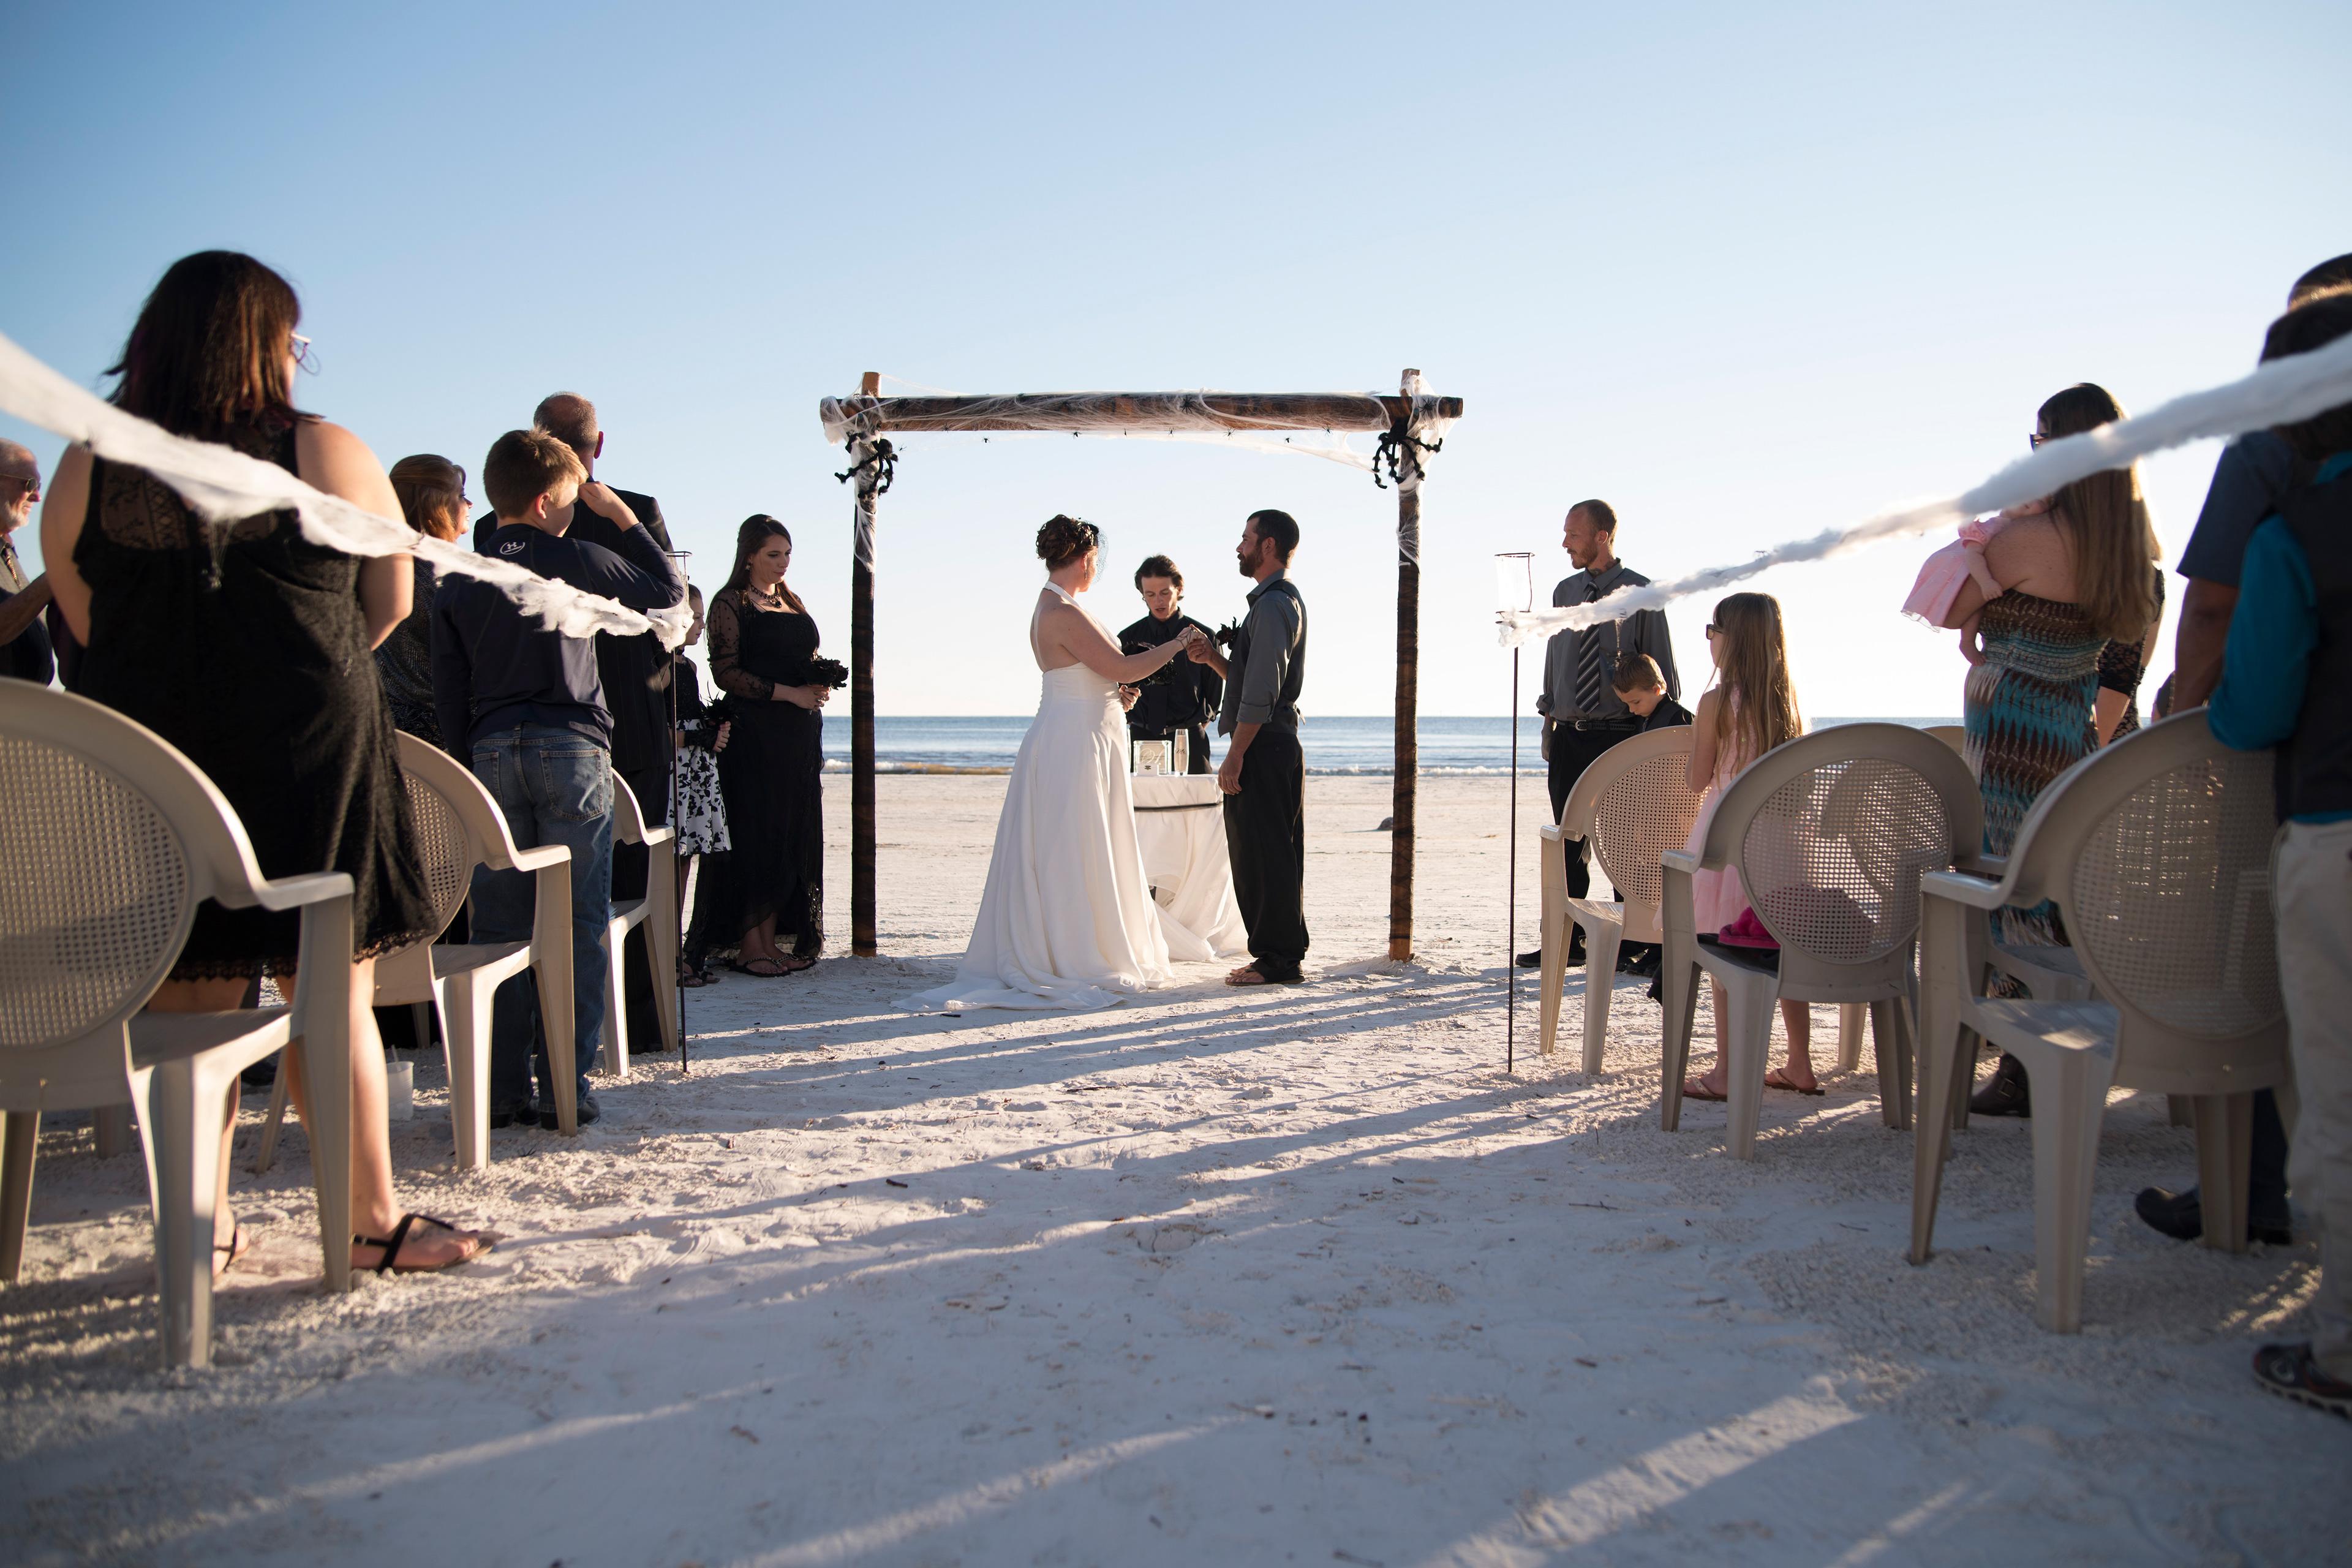 Courtney Nicole Photography - Shanblatt wedding